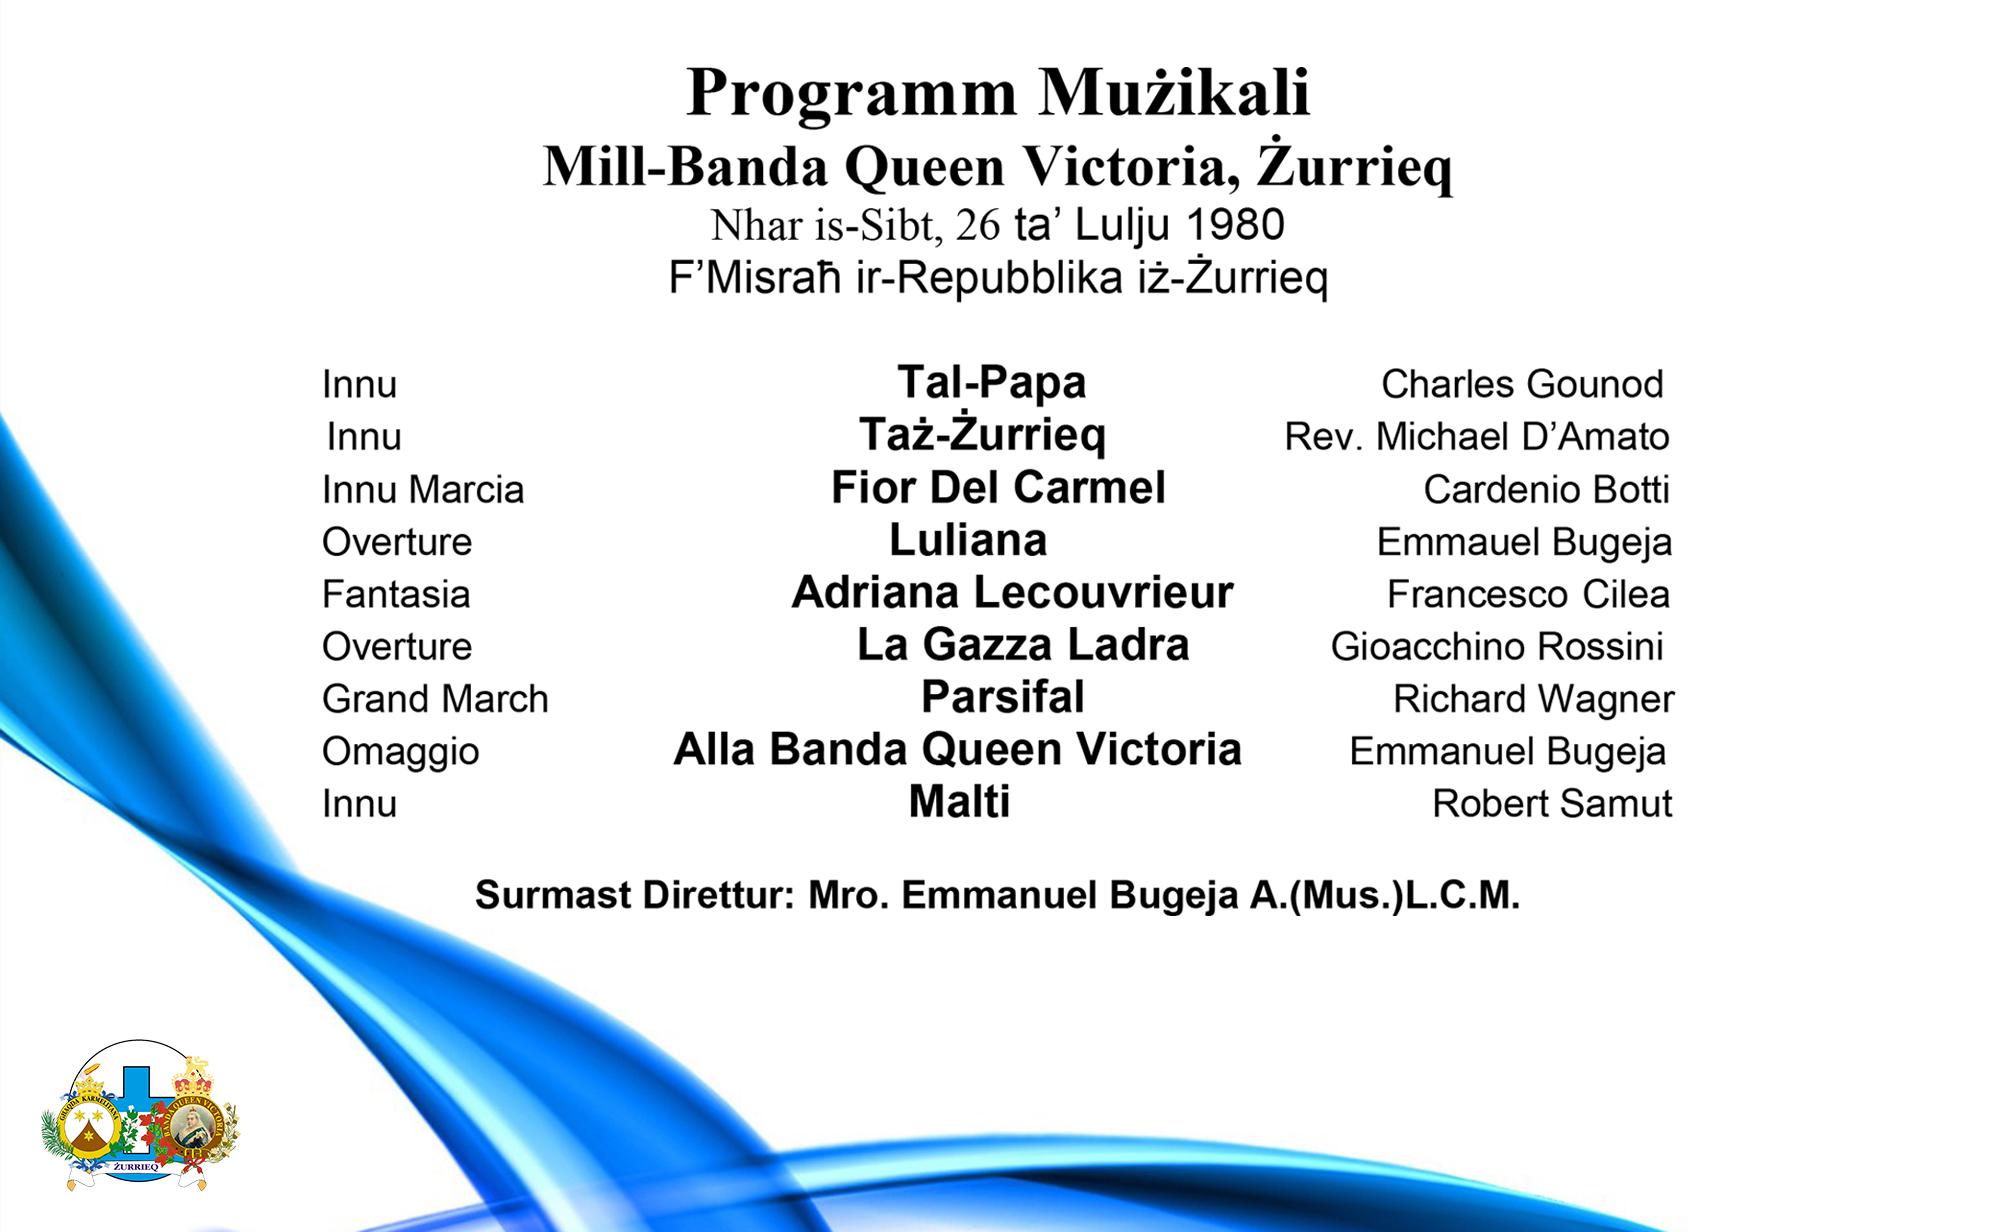 1980 Programm Strumentali